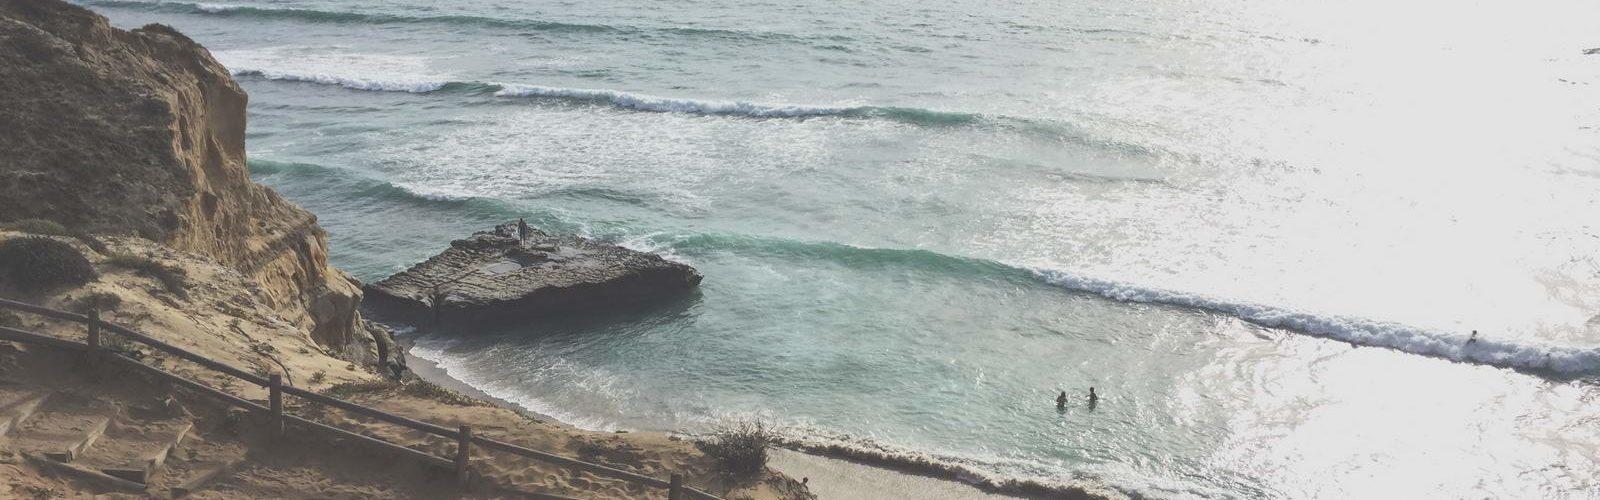 journee-jolla-quartier-san-diego-californie-sud-plage-station-balneaire-pacifique-04